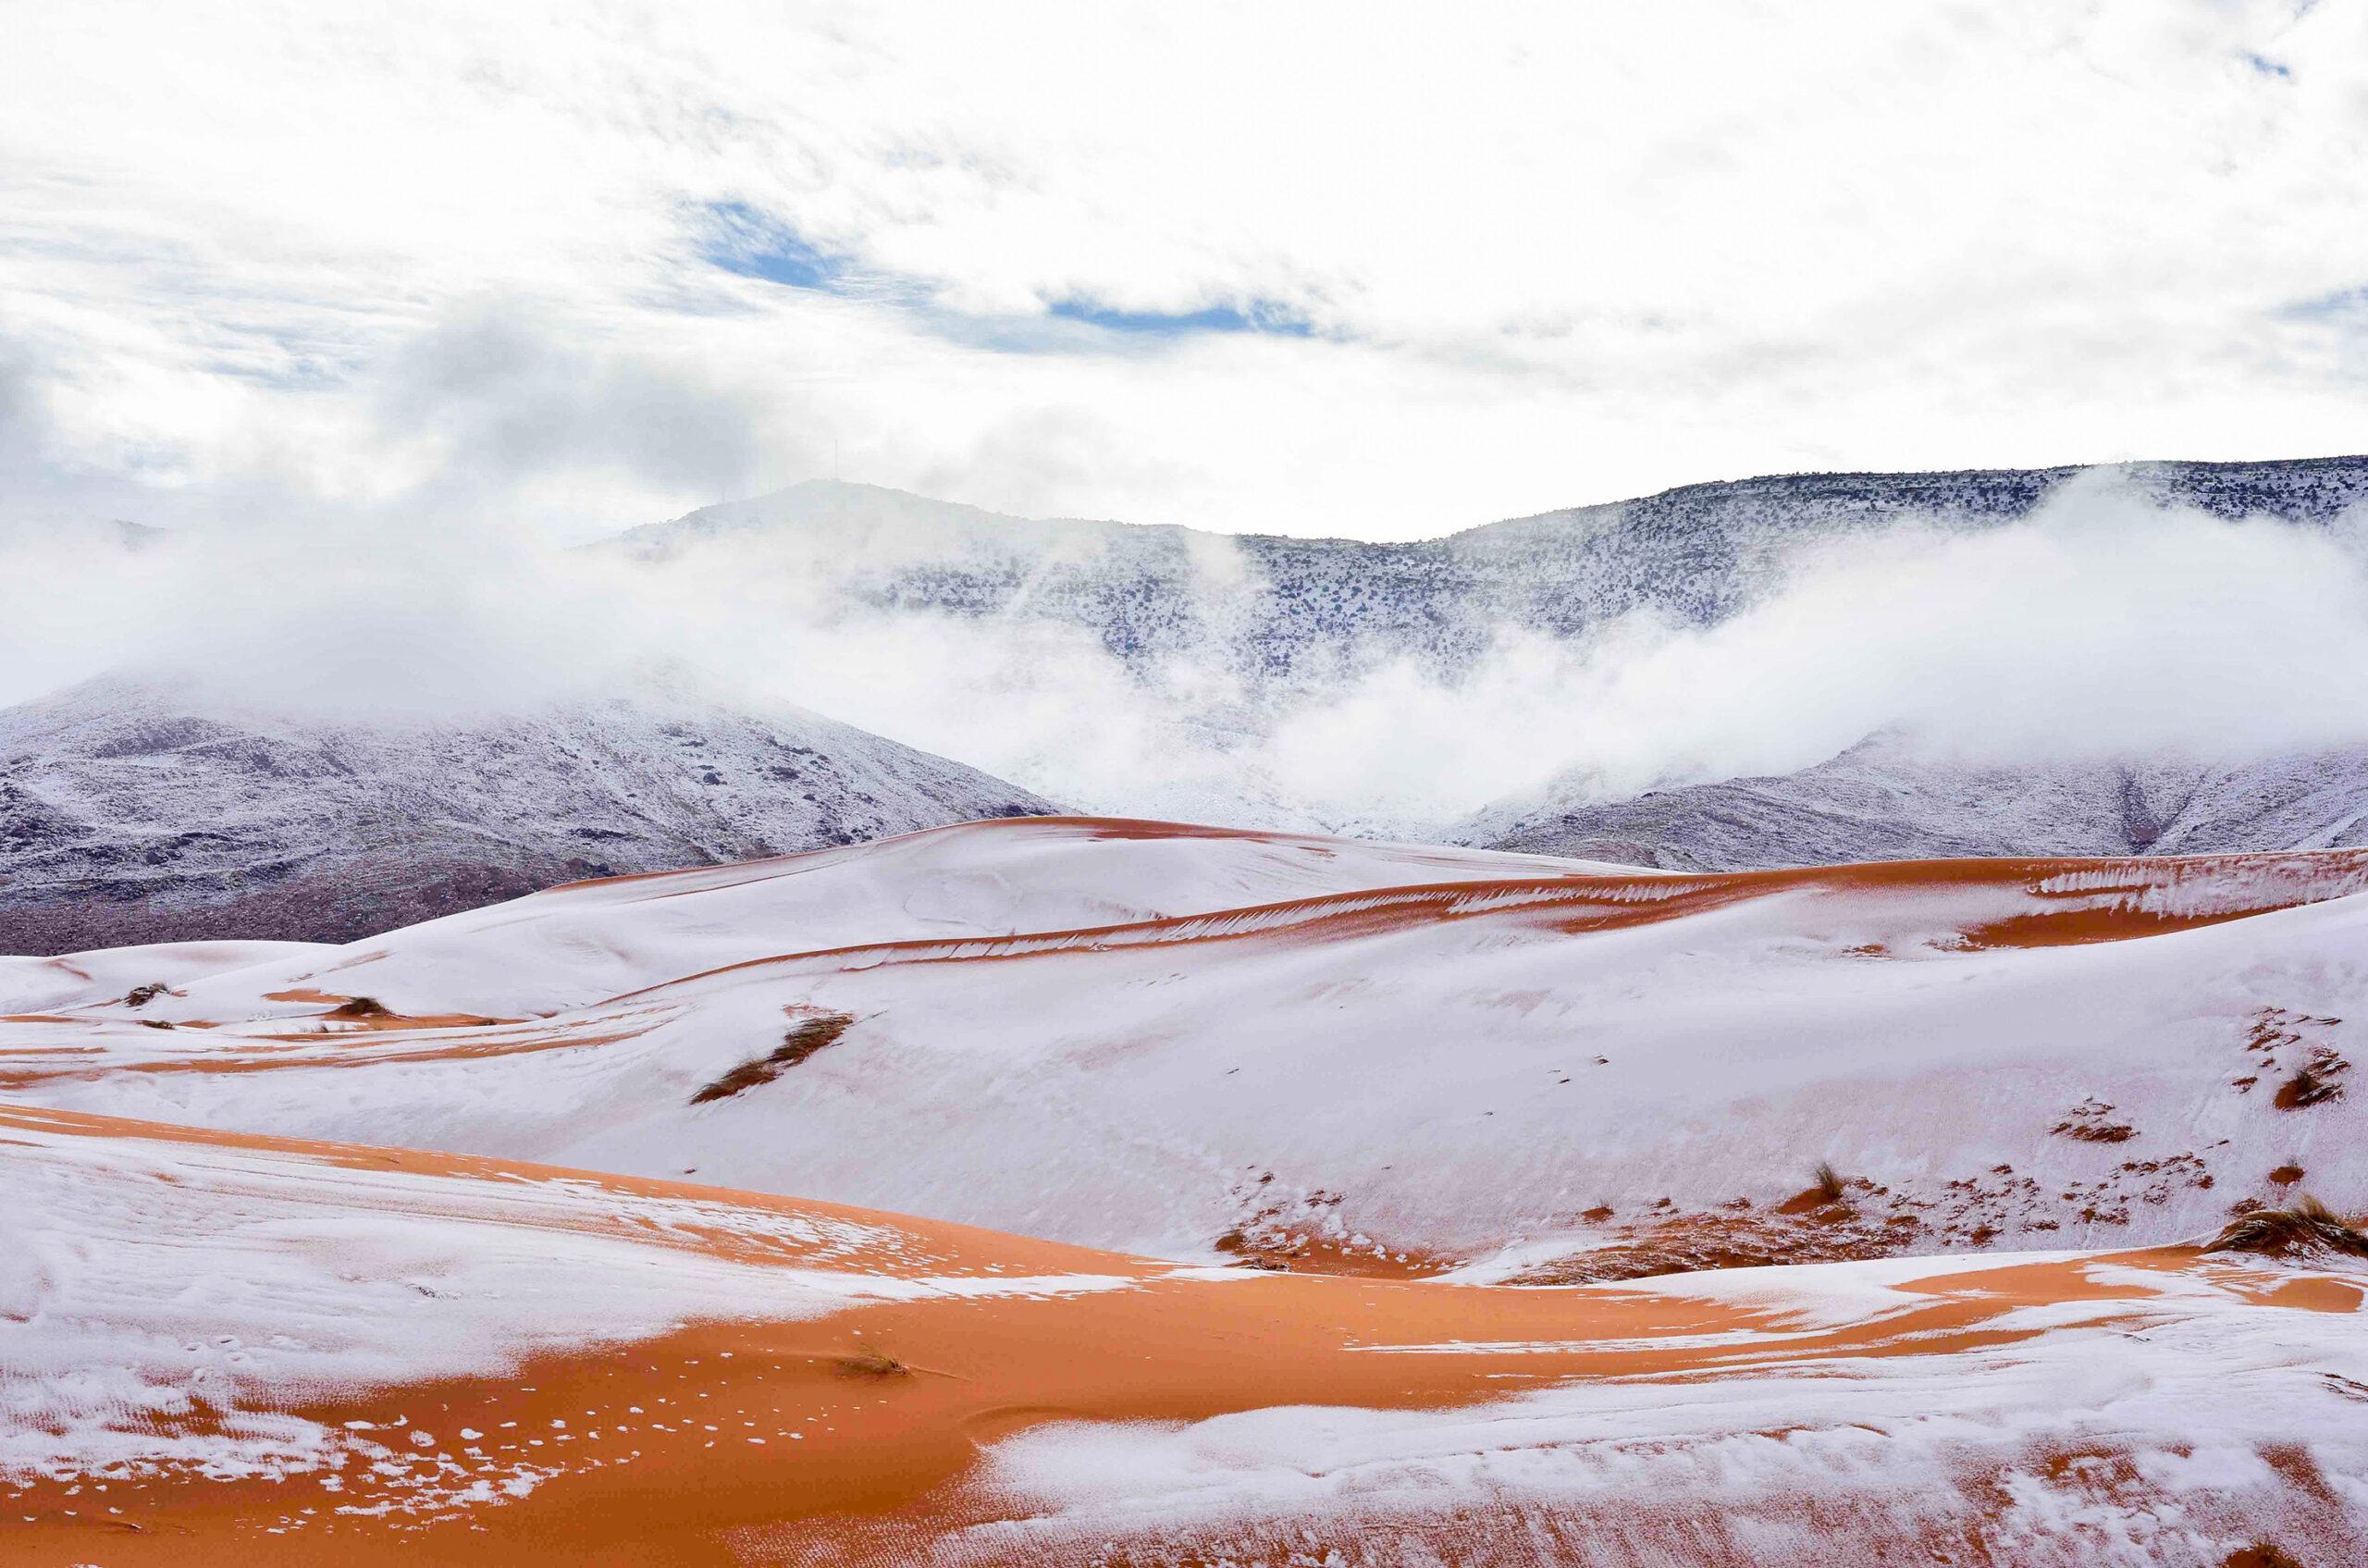 gr weather sahara desert snow024a custom 2e26aa764a8fcb12bd27ea8420857b17e5163e01 scaled